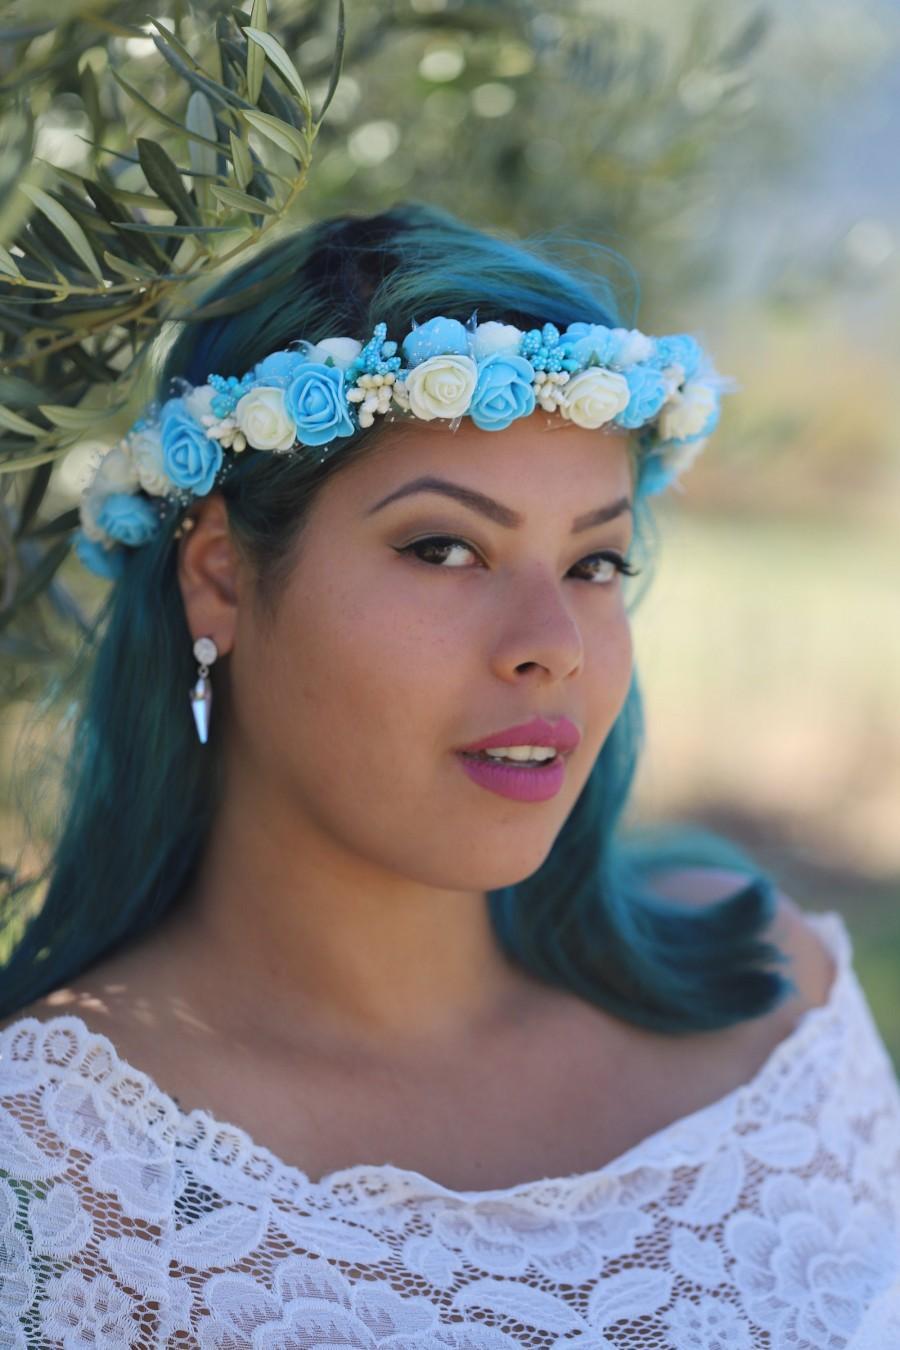 Wedding - Turquoise Ivory Flower Bridal Crown  Flower Wedding Crown  Bridal Flower Headpiece Bridesmaid flower headpiece, Wedding Flower Crown Tiara